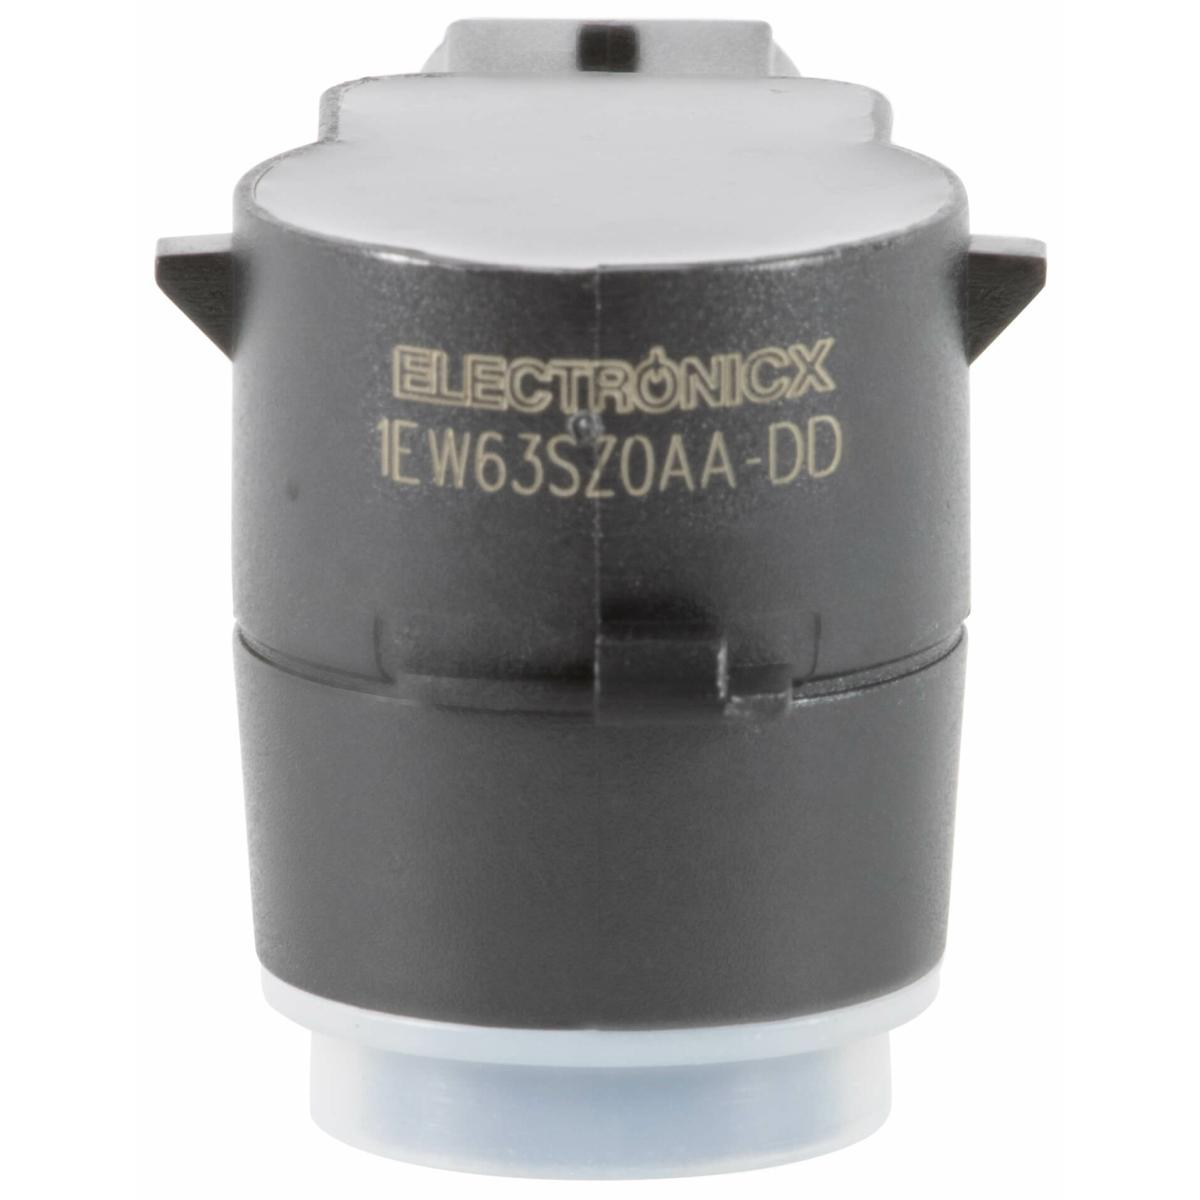 Park sensor 1EW63SZ0AA-DD for Chrysler PDC Parktronic